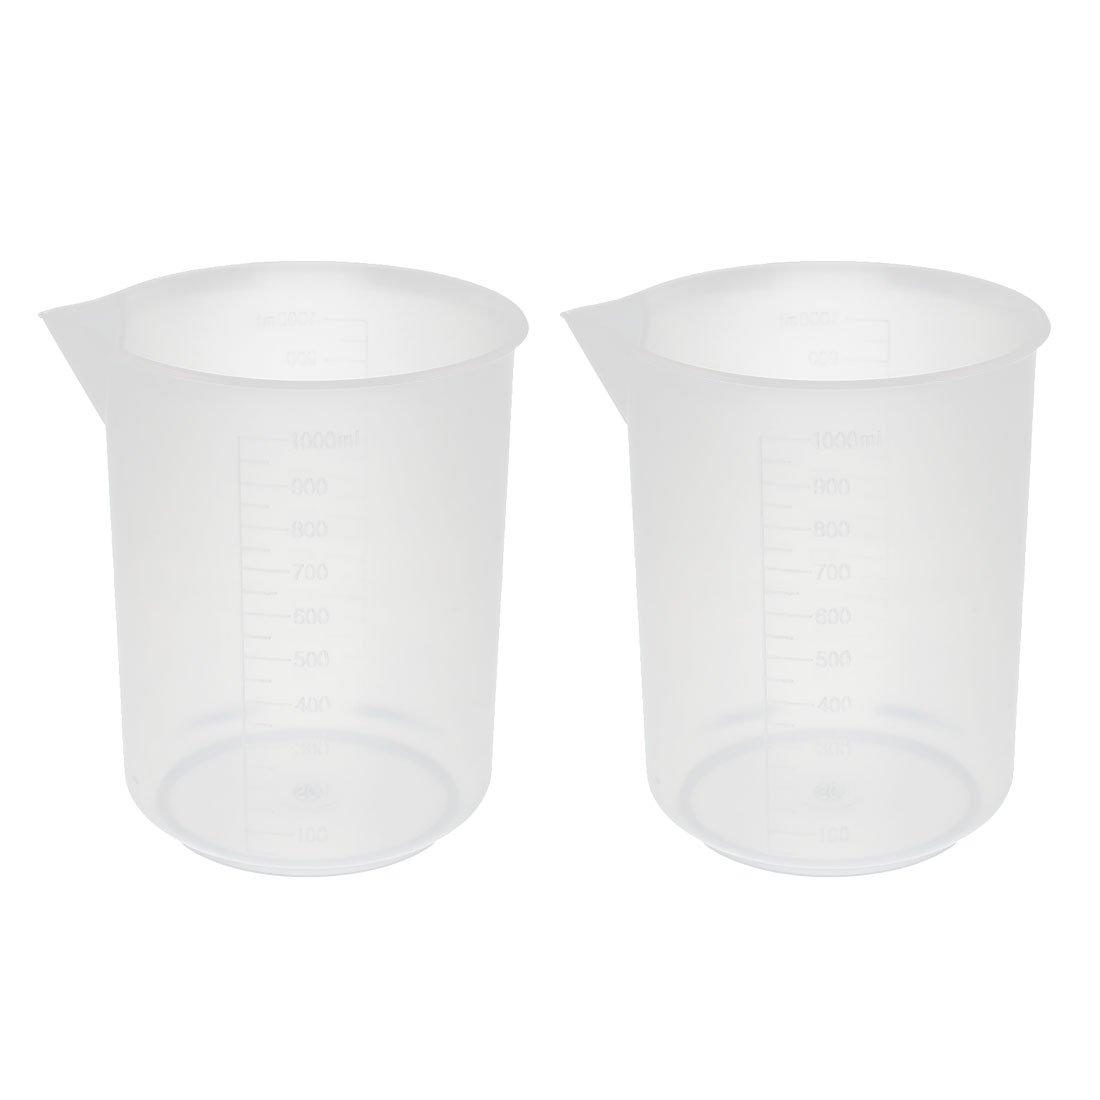 uxcell 2 Pcs 1000mL School Laboratory Transparent Plastic Liquid Container Measuring Cup Beaker